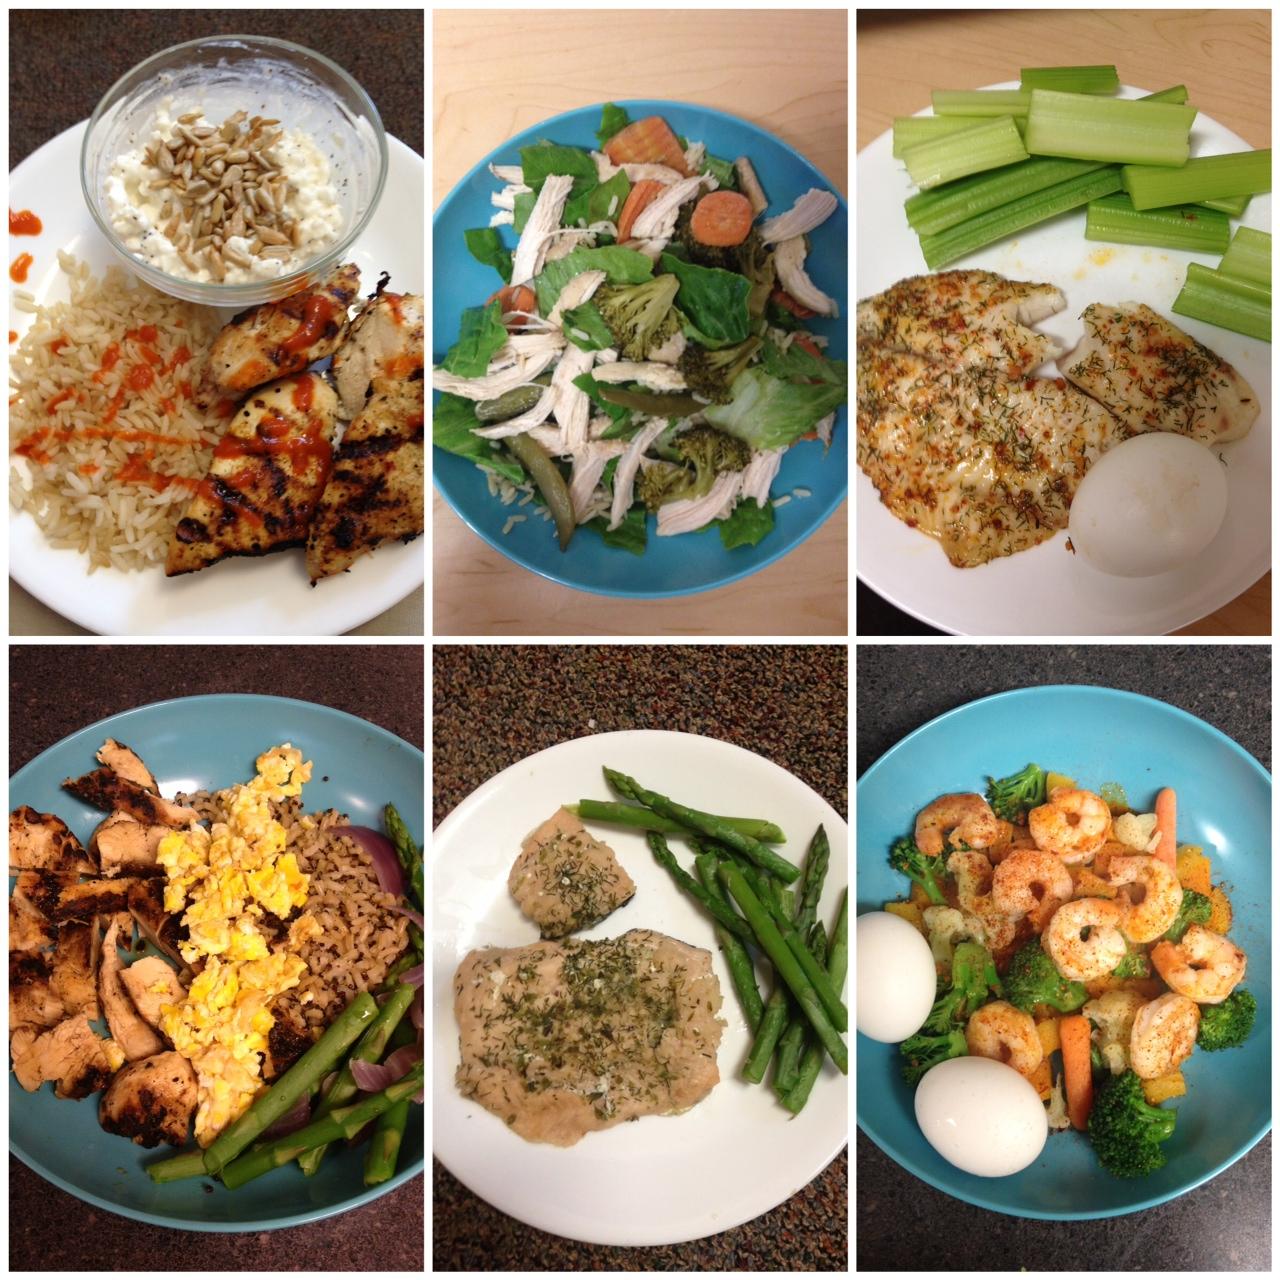 Is Military Food Package Healthy